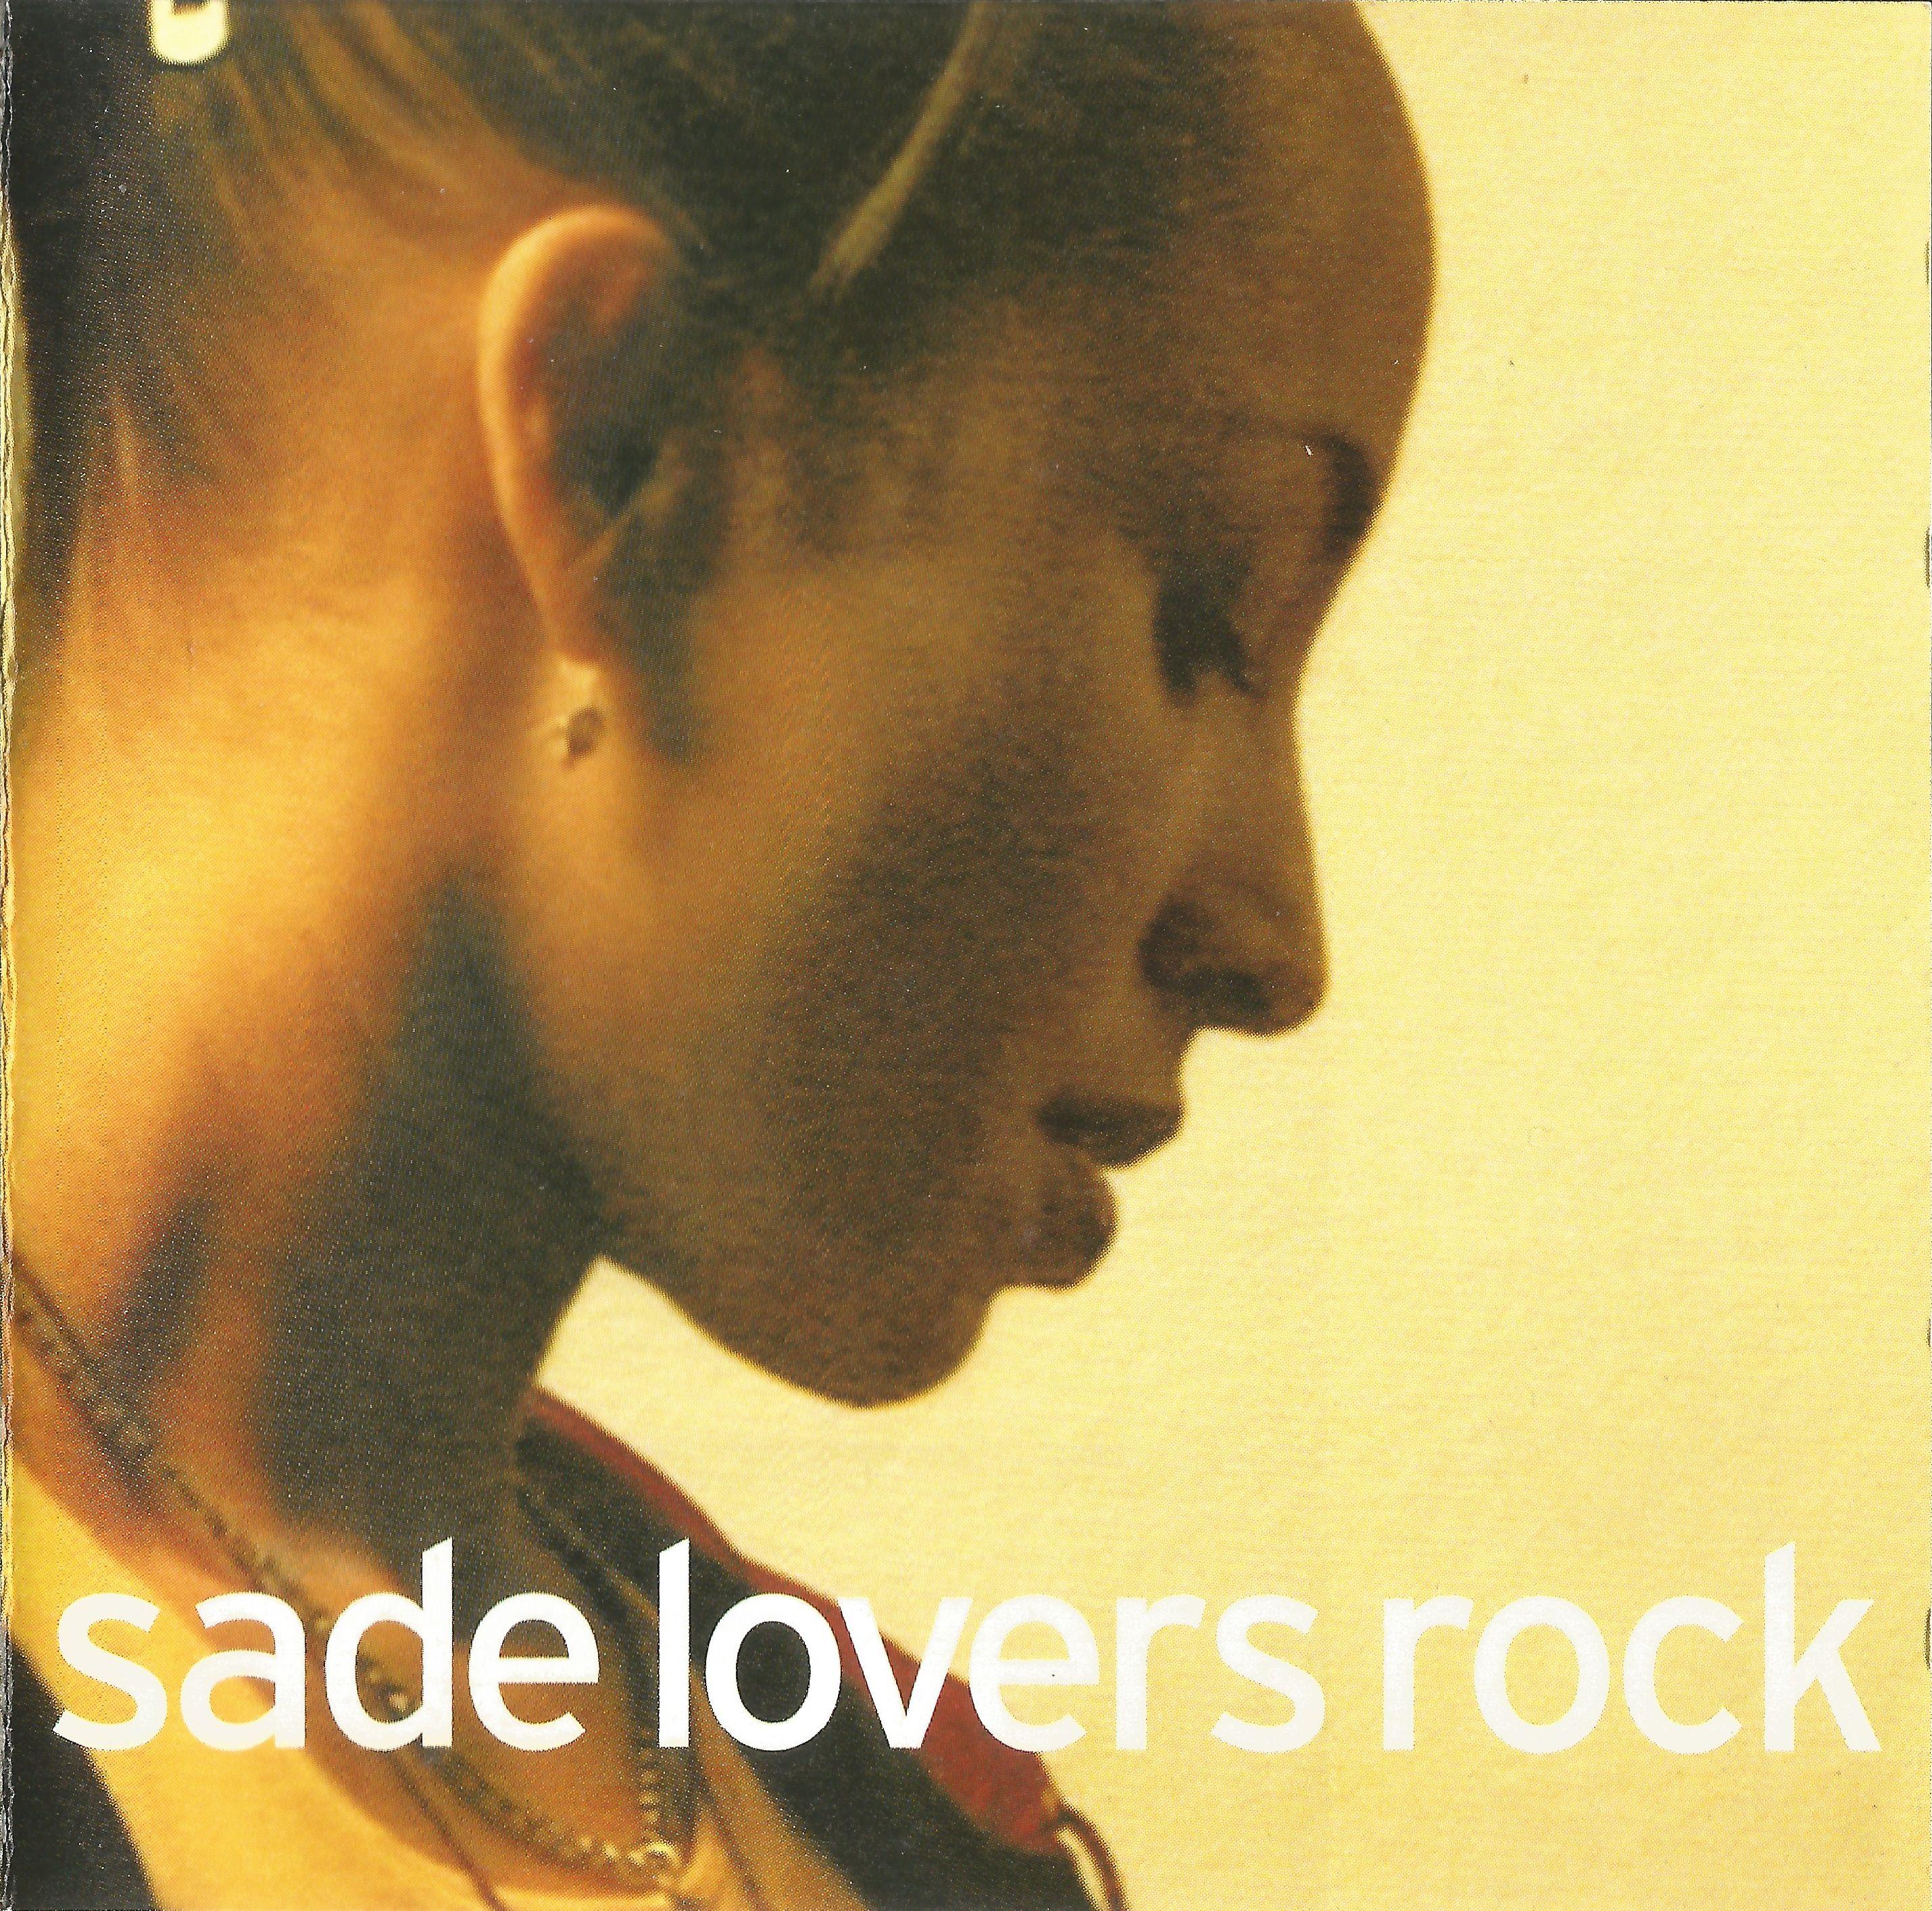 Sade - Lovers Rock album cover